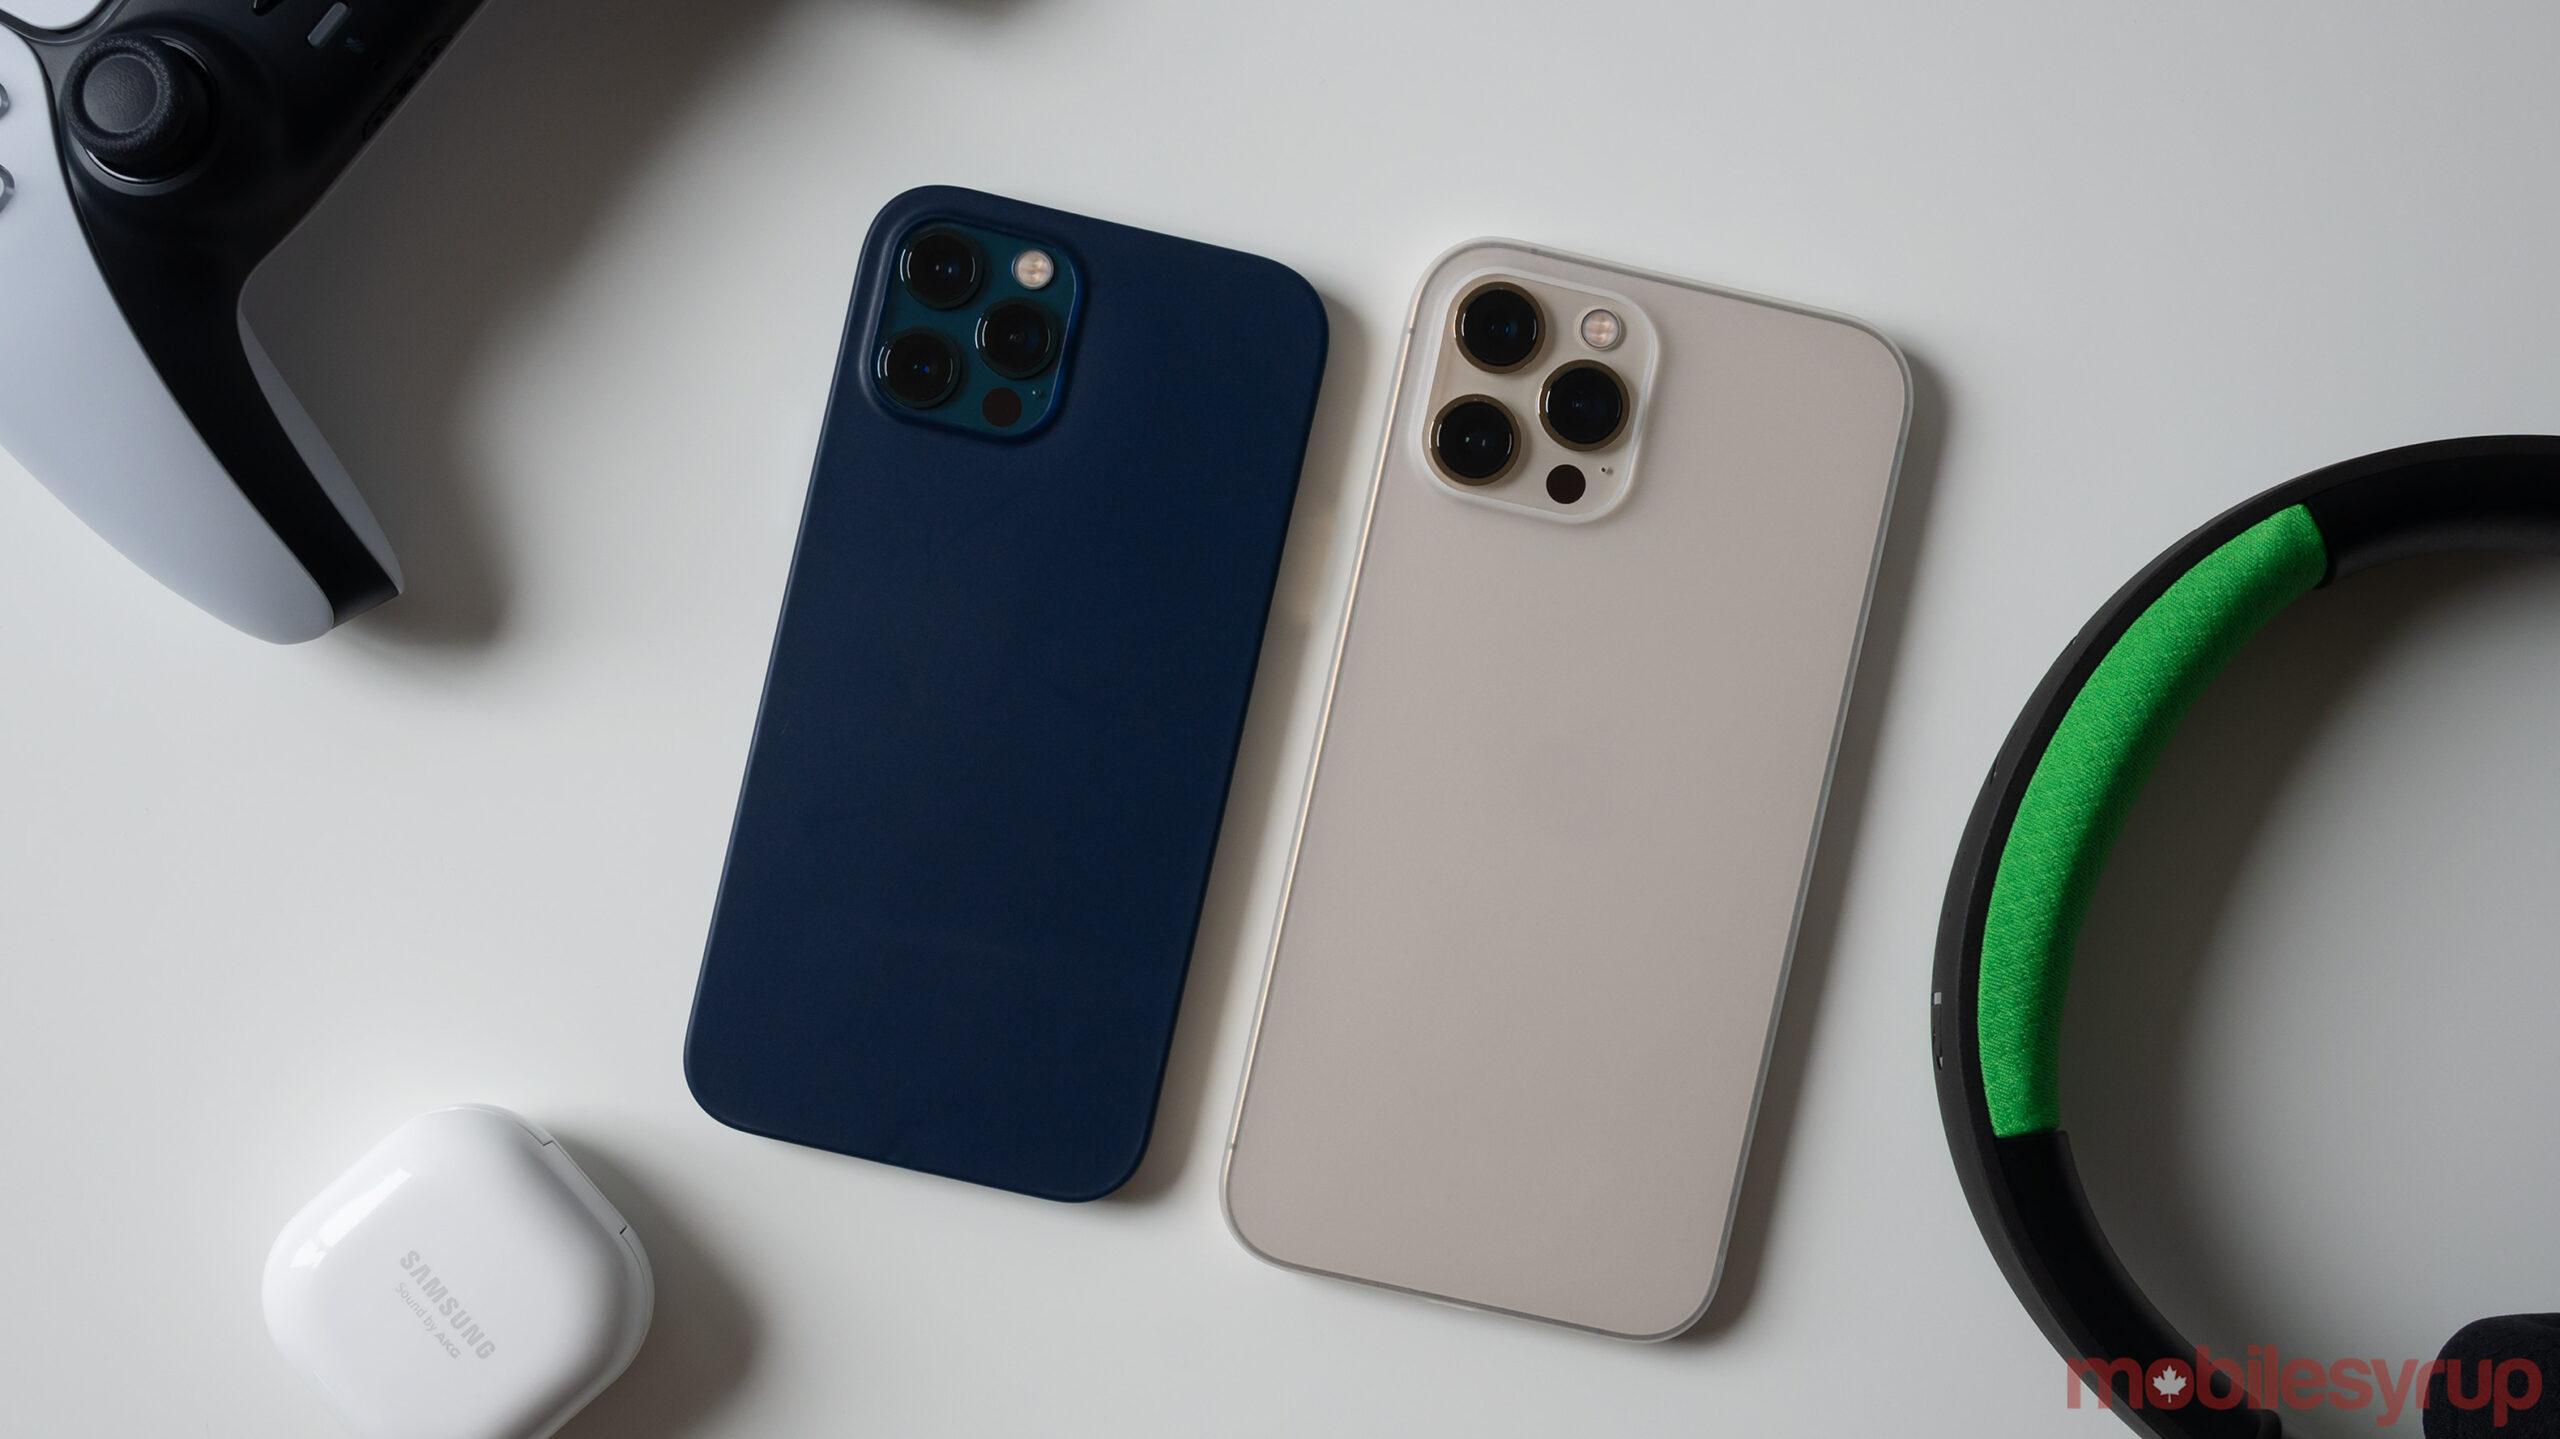 Totallee smartphone cases